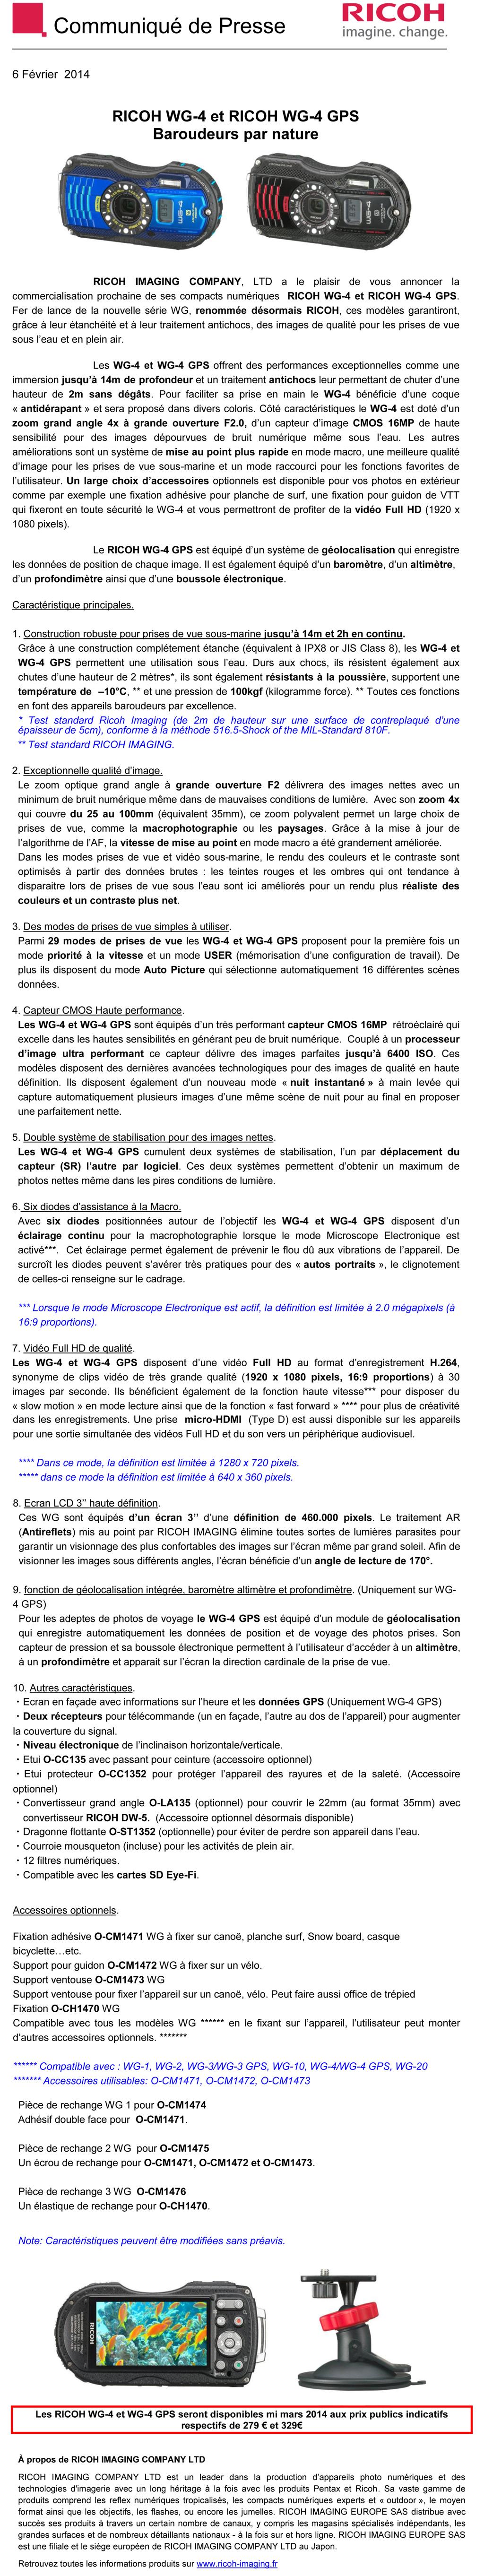 PENTAX RICOH IMAGING - CP 06/02/2014 - RICOH WG-4 et RICOH WG-4 GPS Illj